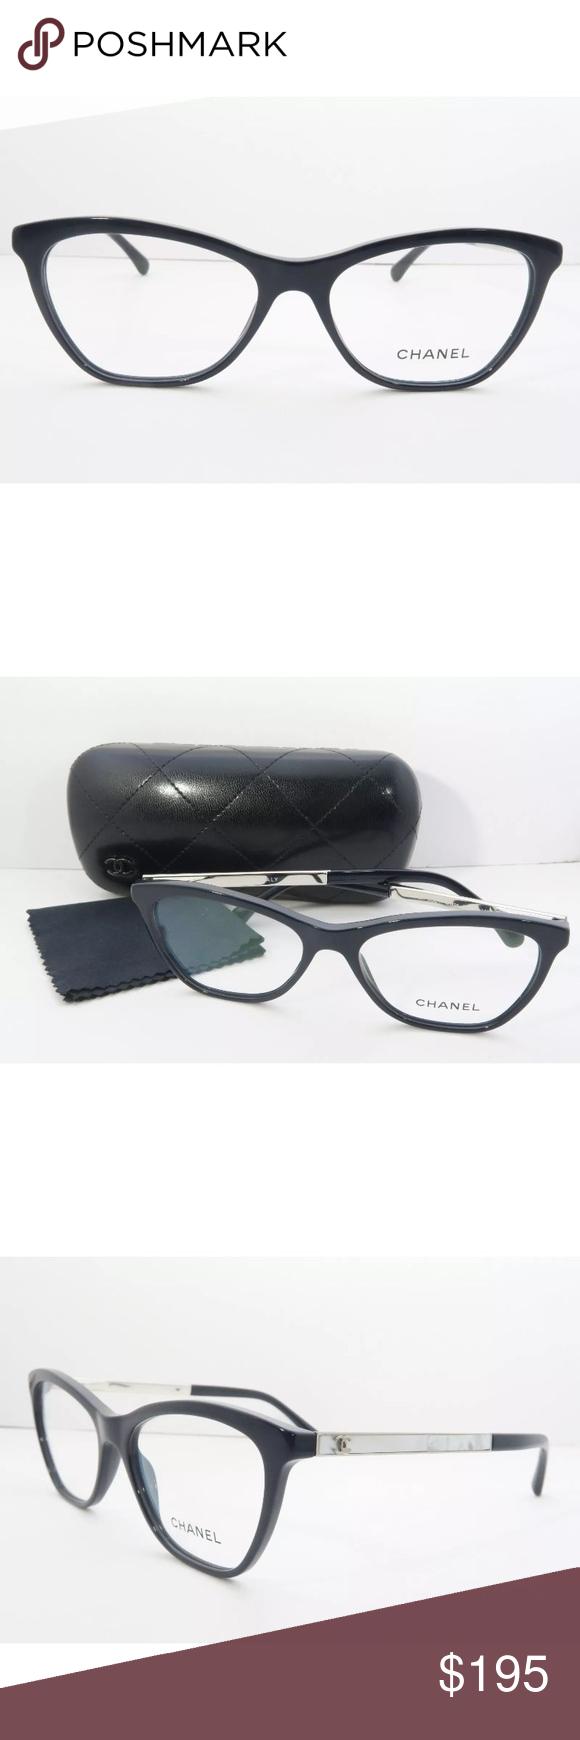 28a2931ec94b Chanel eyeglasses 3330 Blue Frame with Clear Lens New with clear lens Comes  with Chanel case